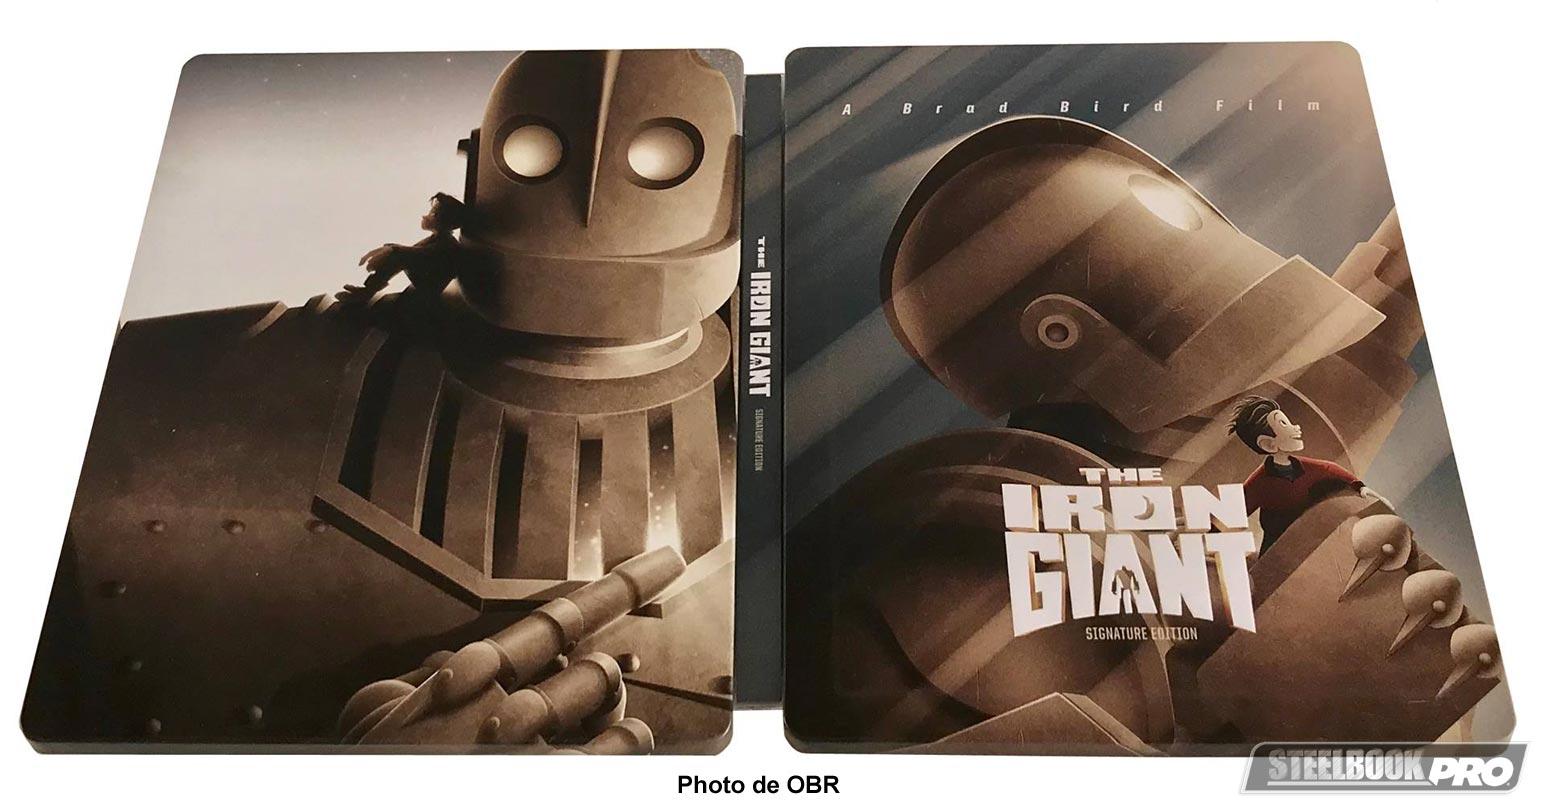 The-Iron-Giant-steelbook-2